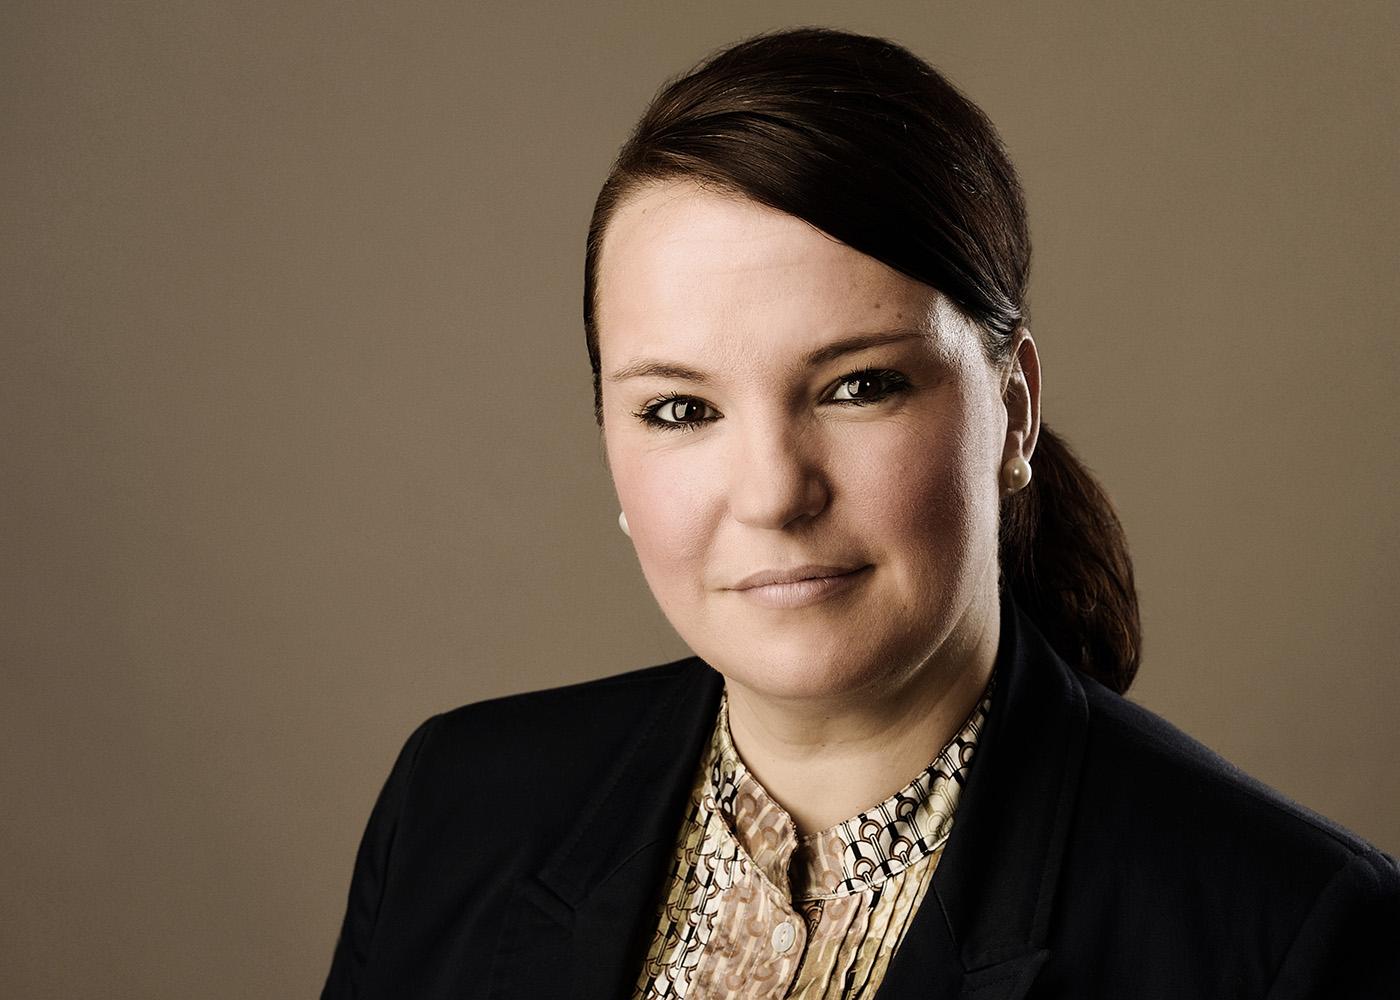 Nadine Schütze